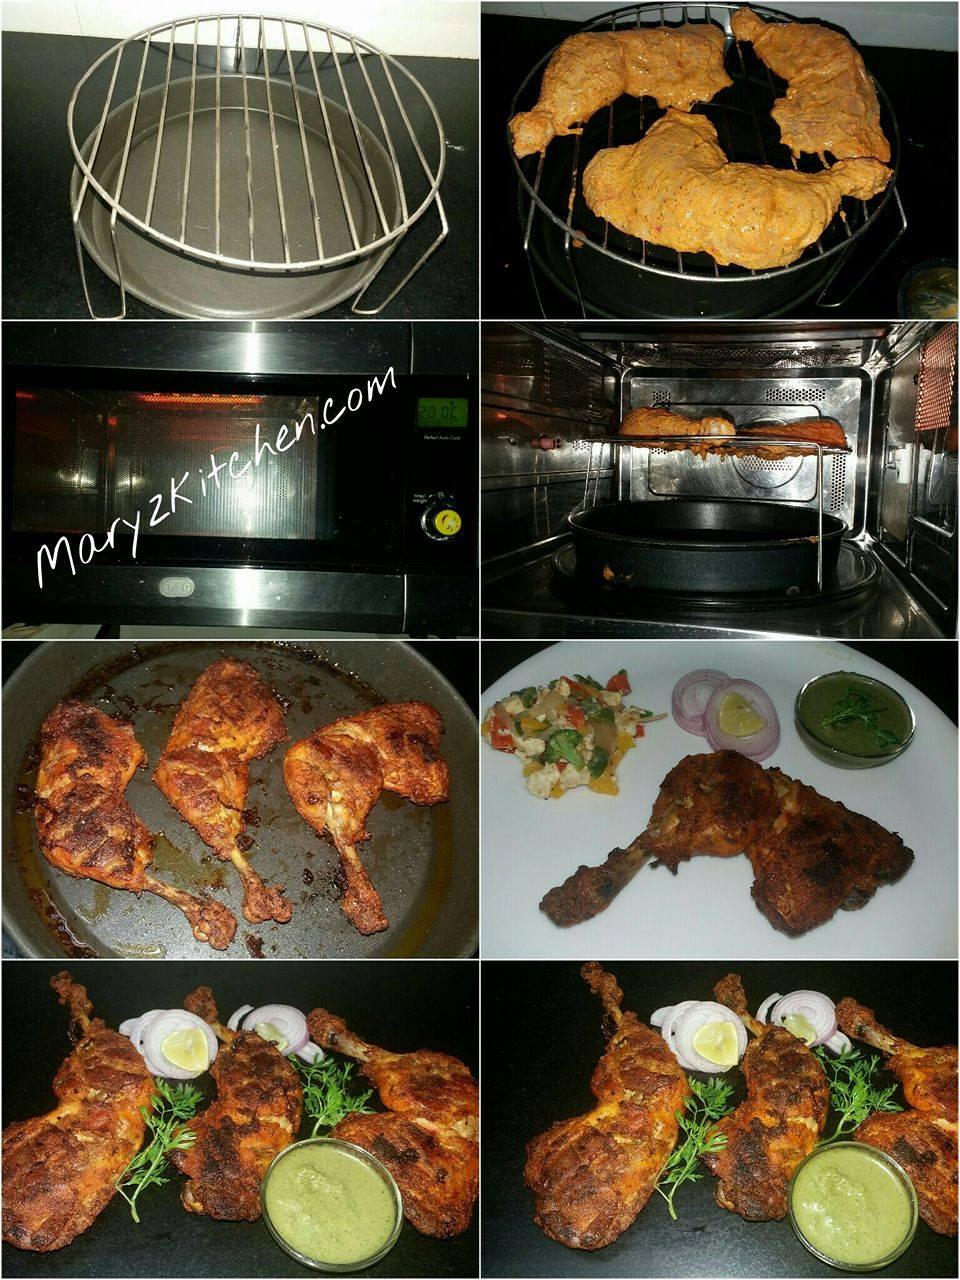 Tandoori kitchen - Tandoori Chicken